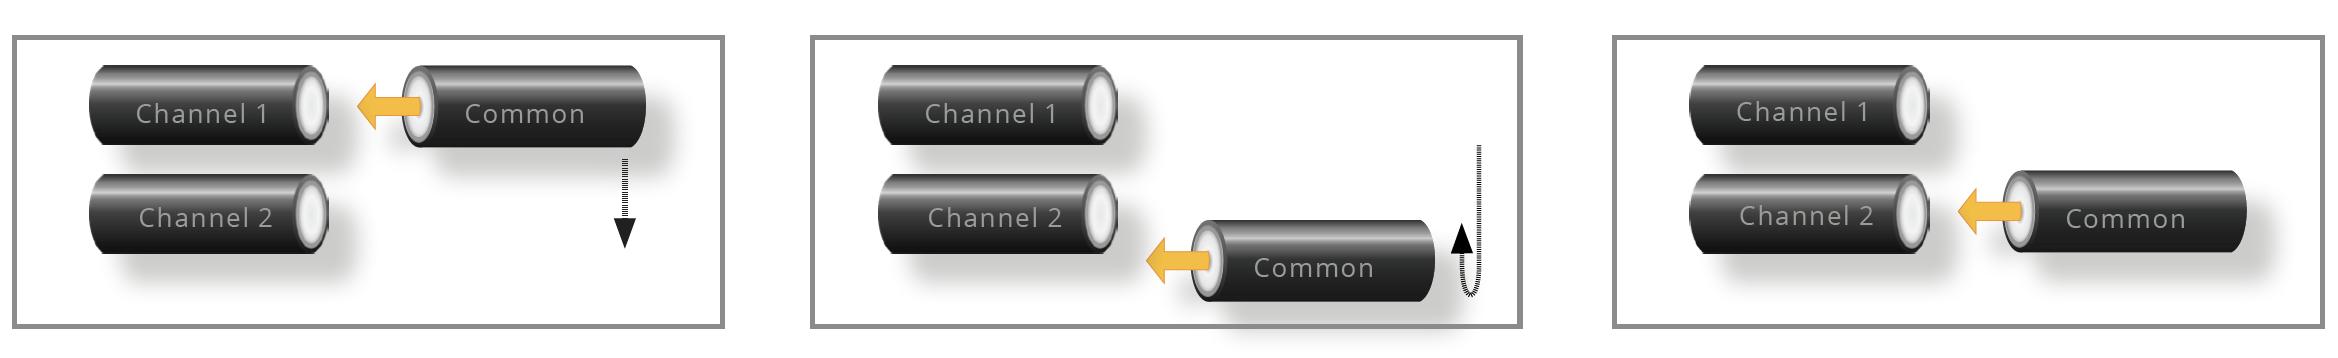 common port moving into alignment illustration